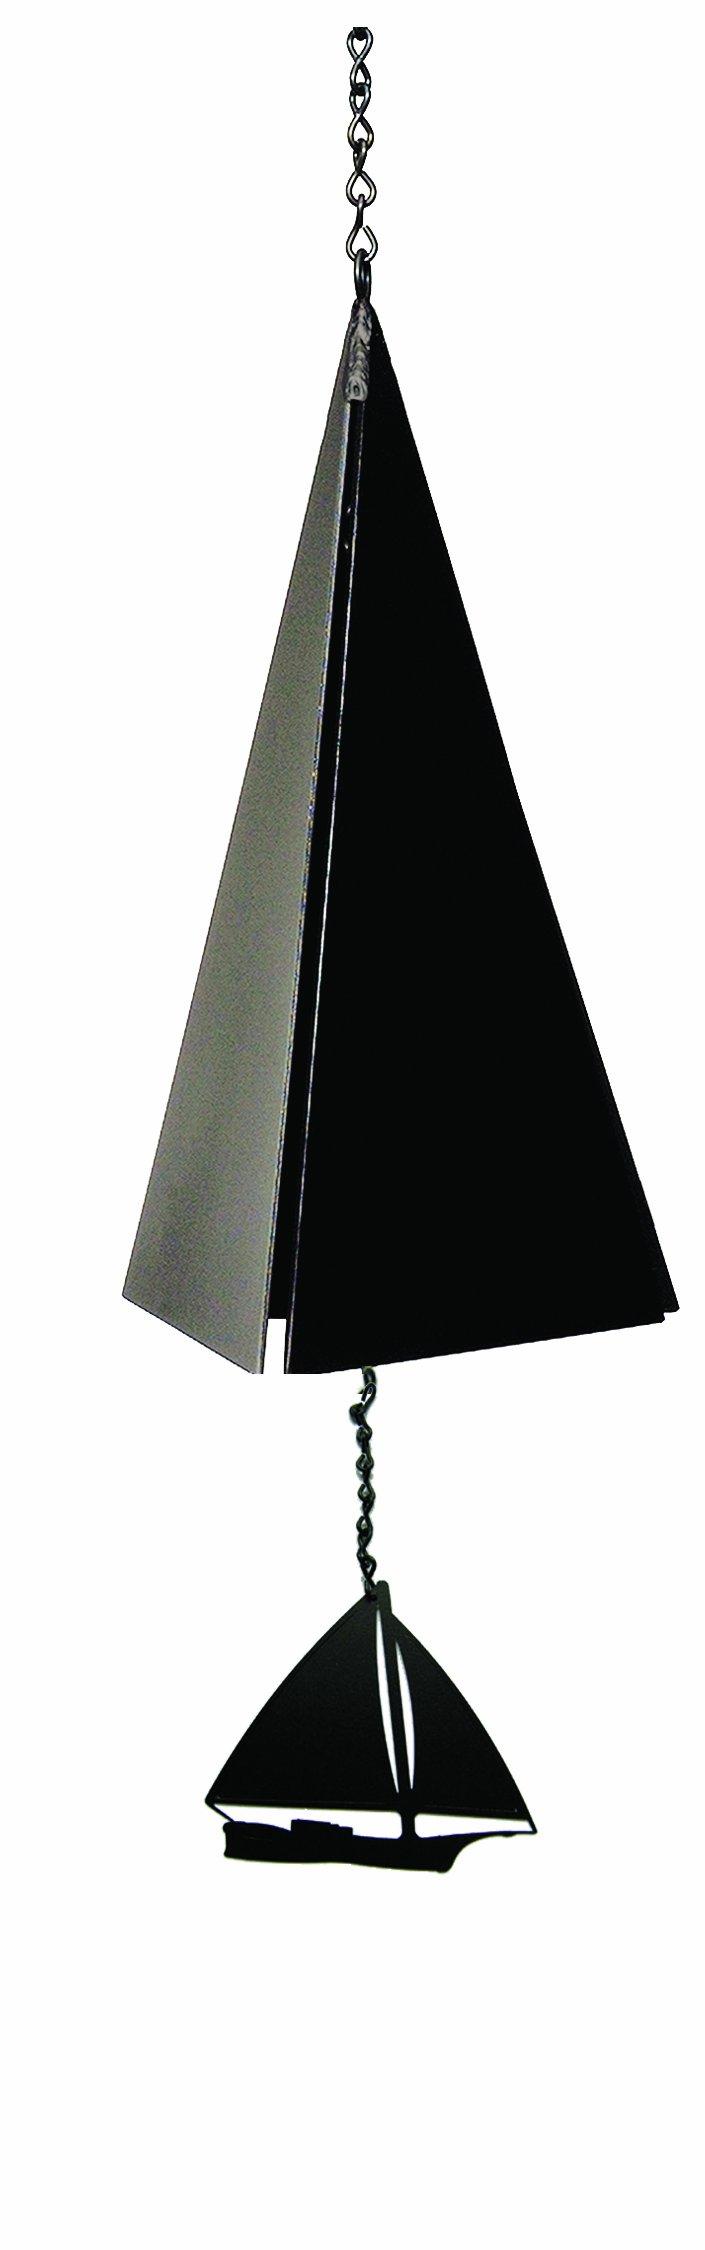 North Country Wind Bells Nantucket Bell Windcatcher with Black Skip Jack